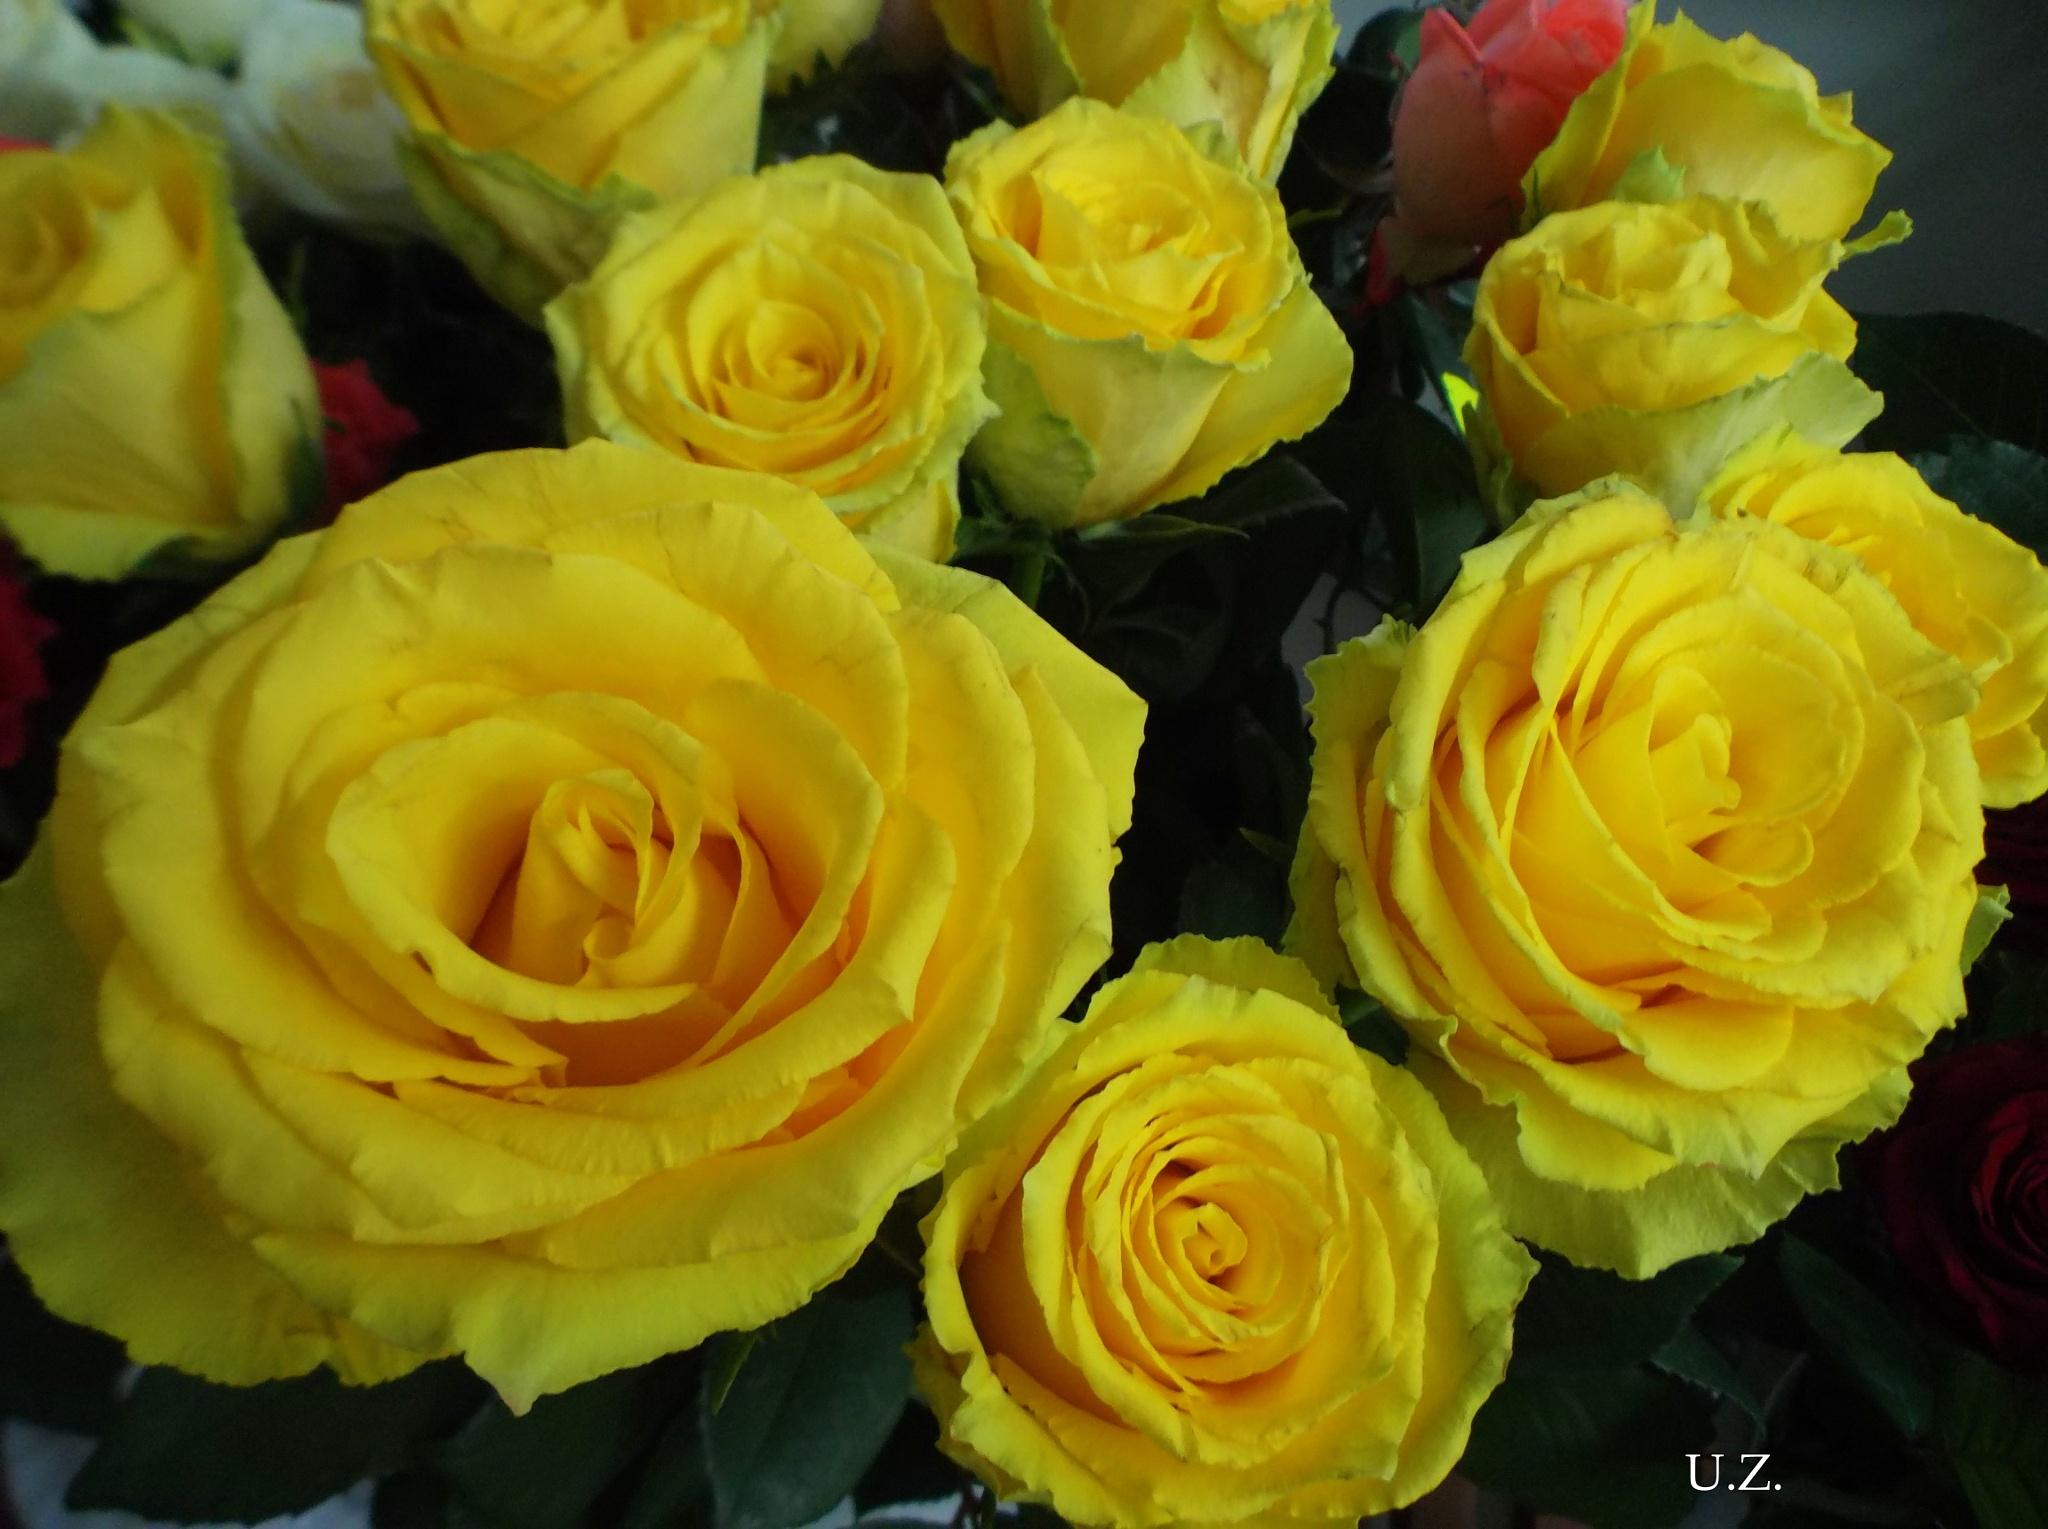 Yelow roses by uzkuraitiene62